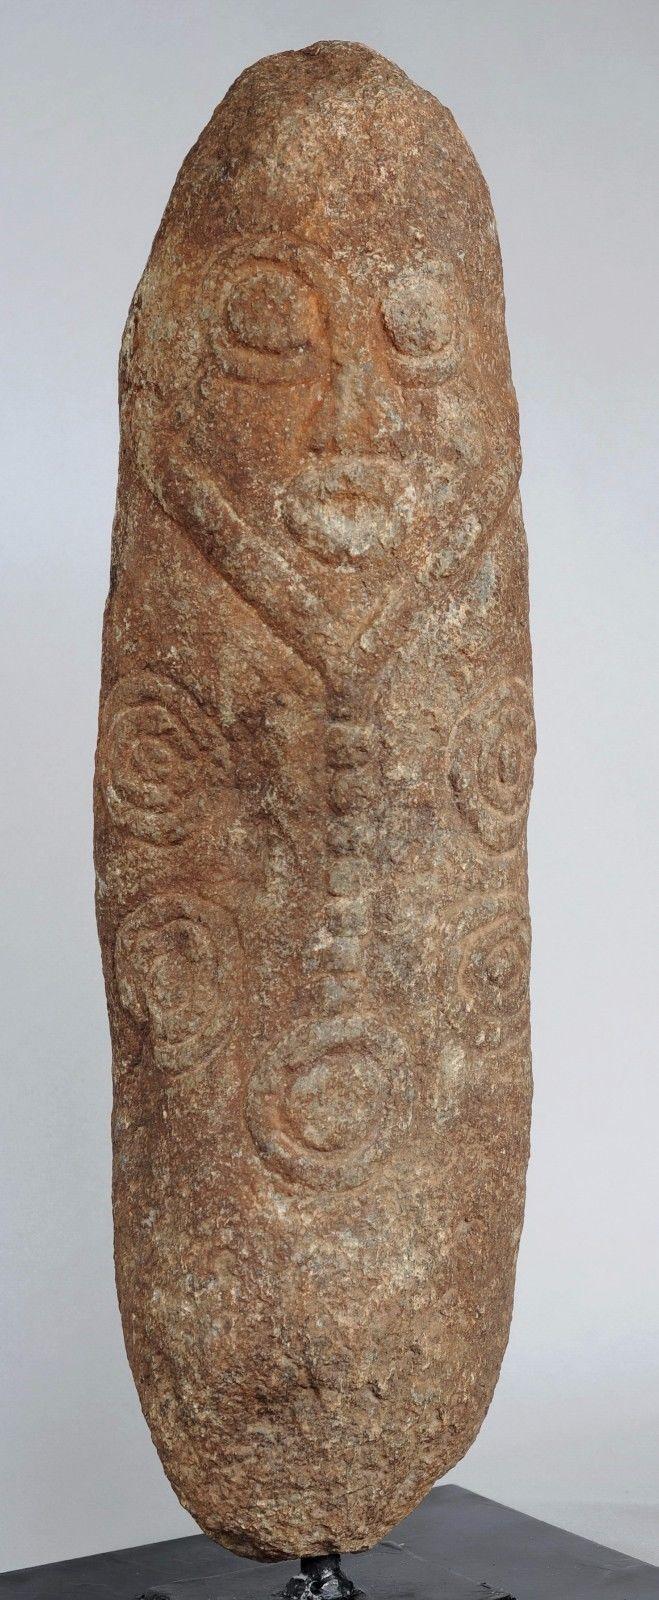 Monolithe Akwanshi Atal Statue pierre Cross River Nigeria stone sculpture Ekoi | eBay